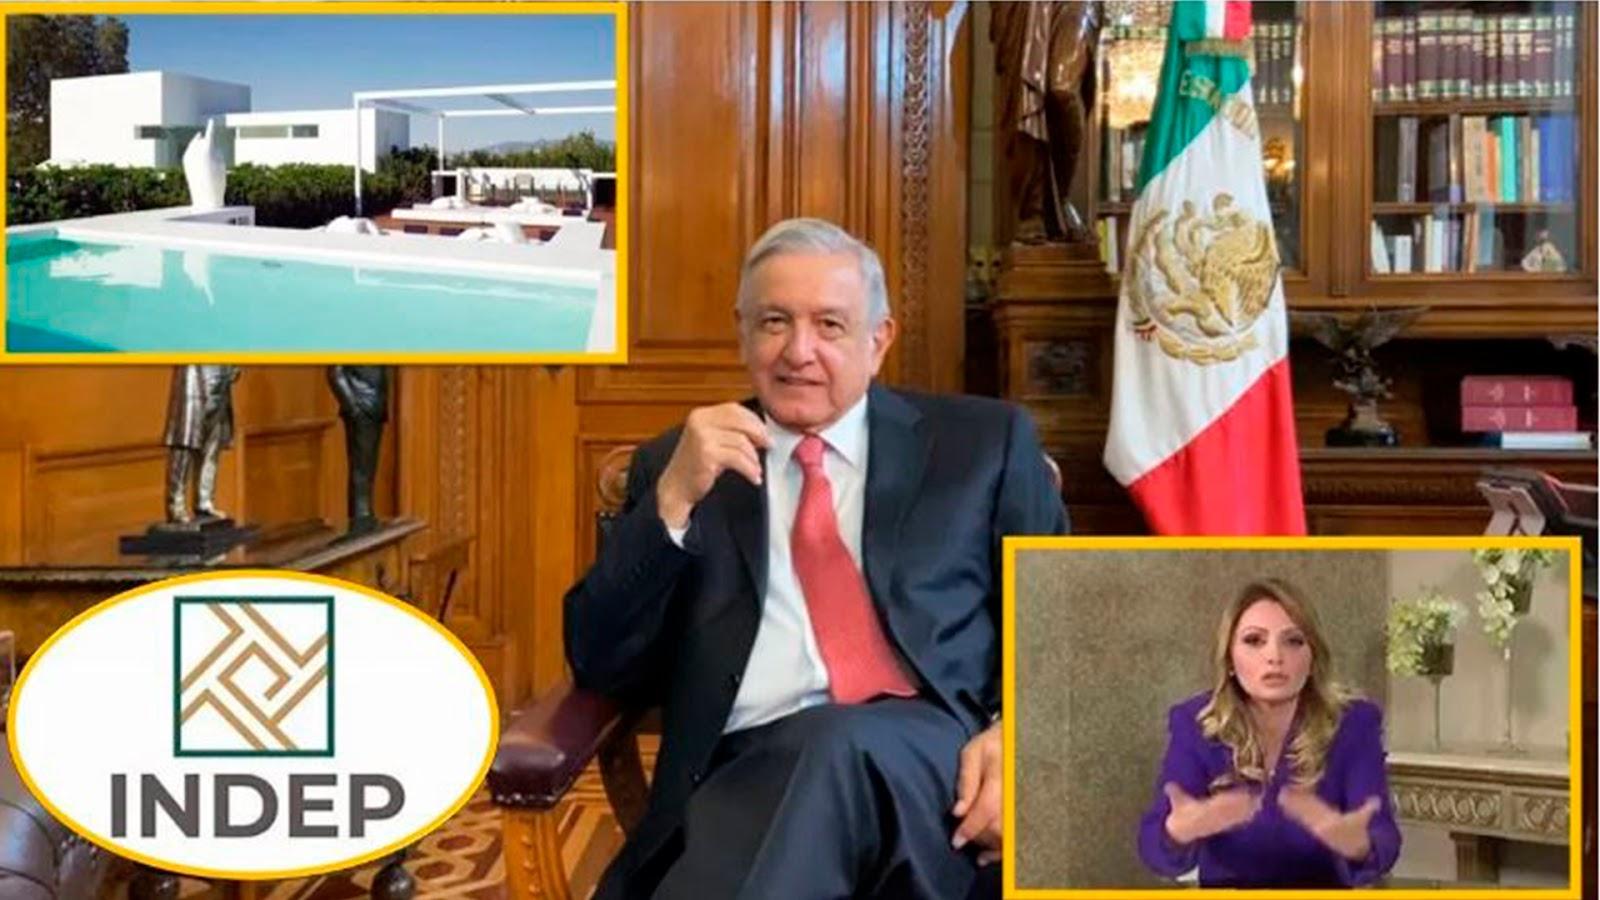 4T devolverá la Casa Blanca de la Gaviota al pueblo: Heraldo de México